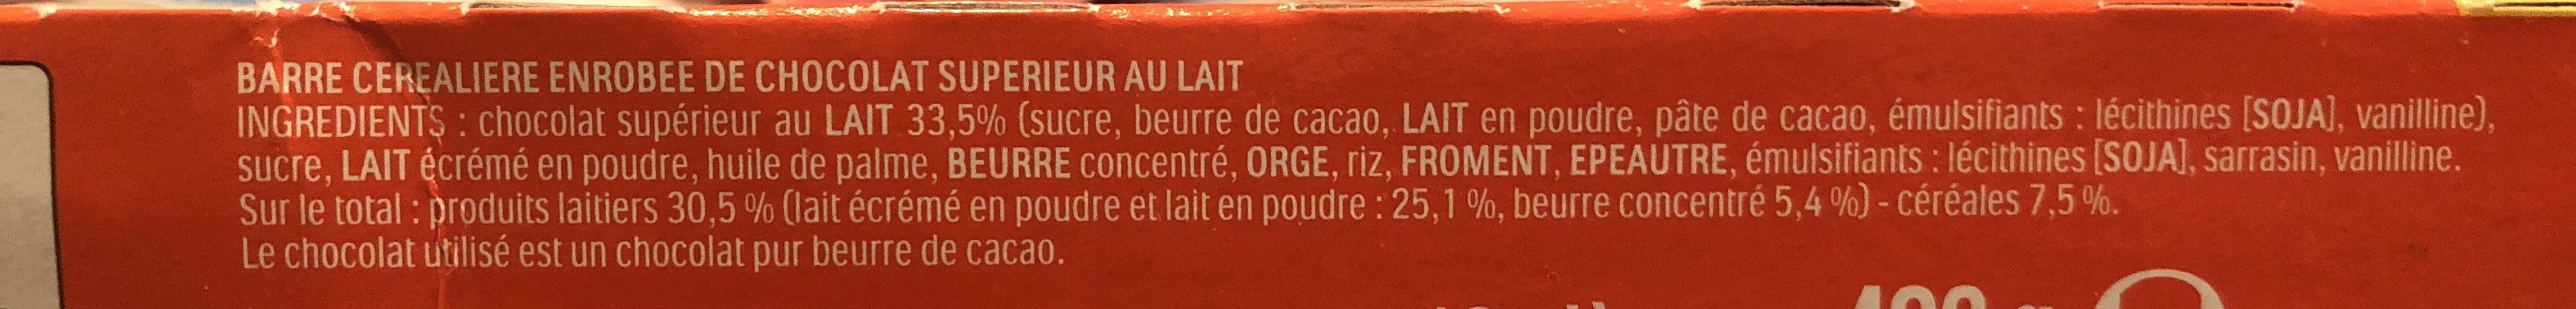 KINDER COUNTRY BARRE DE CEREALES ENROBEE DE CHOCOLAT 2x9 BARRES - Ingrédients - fr